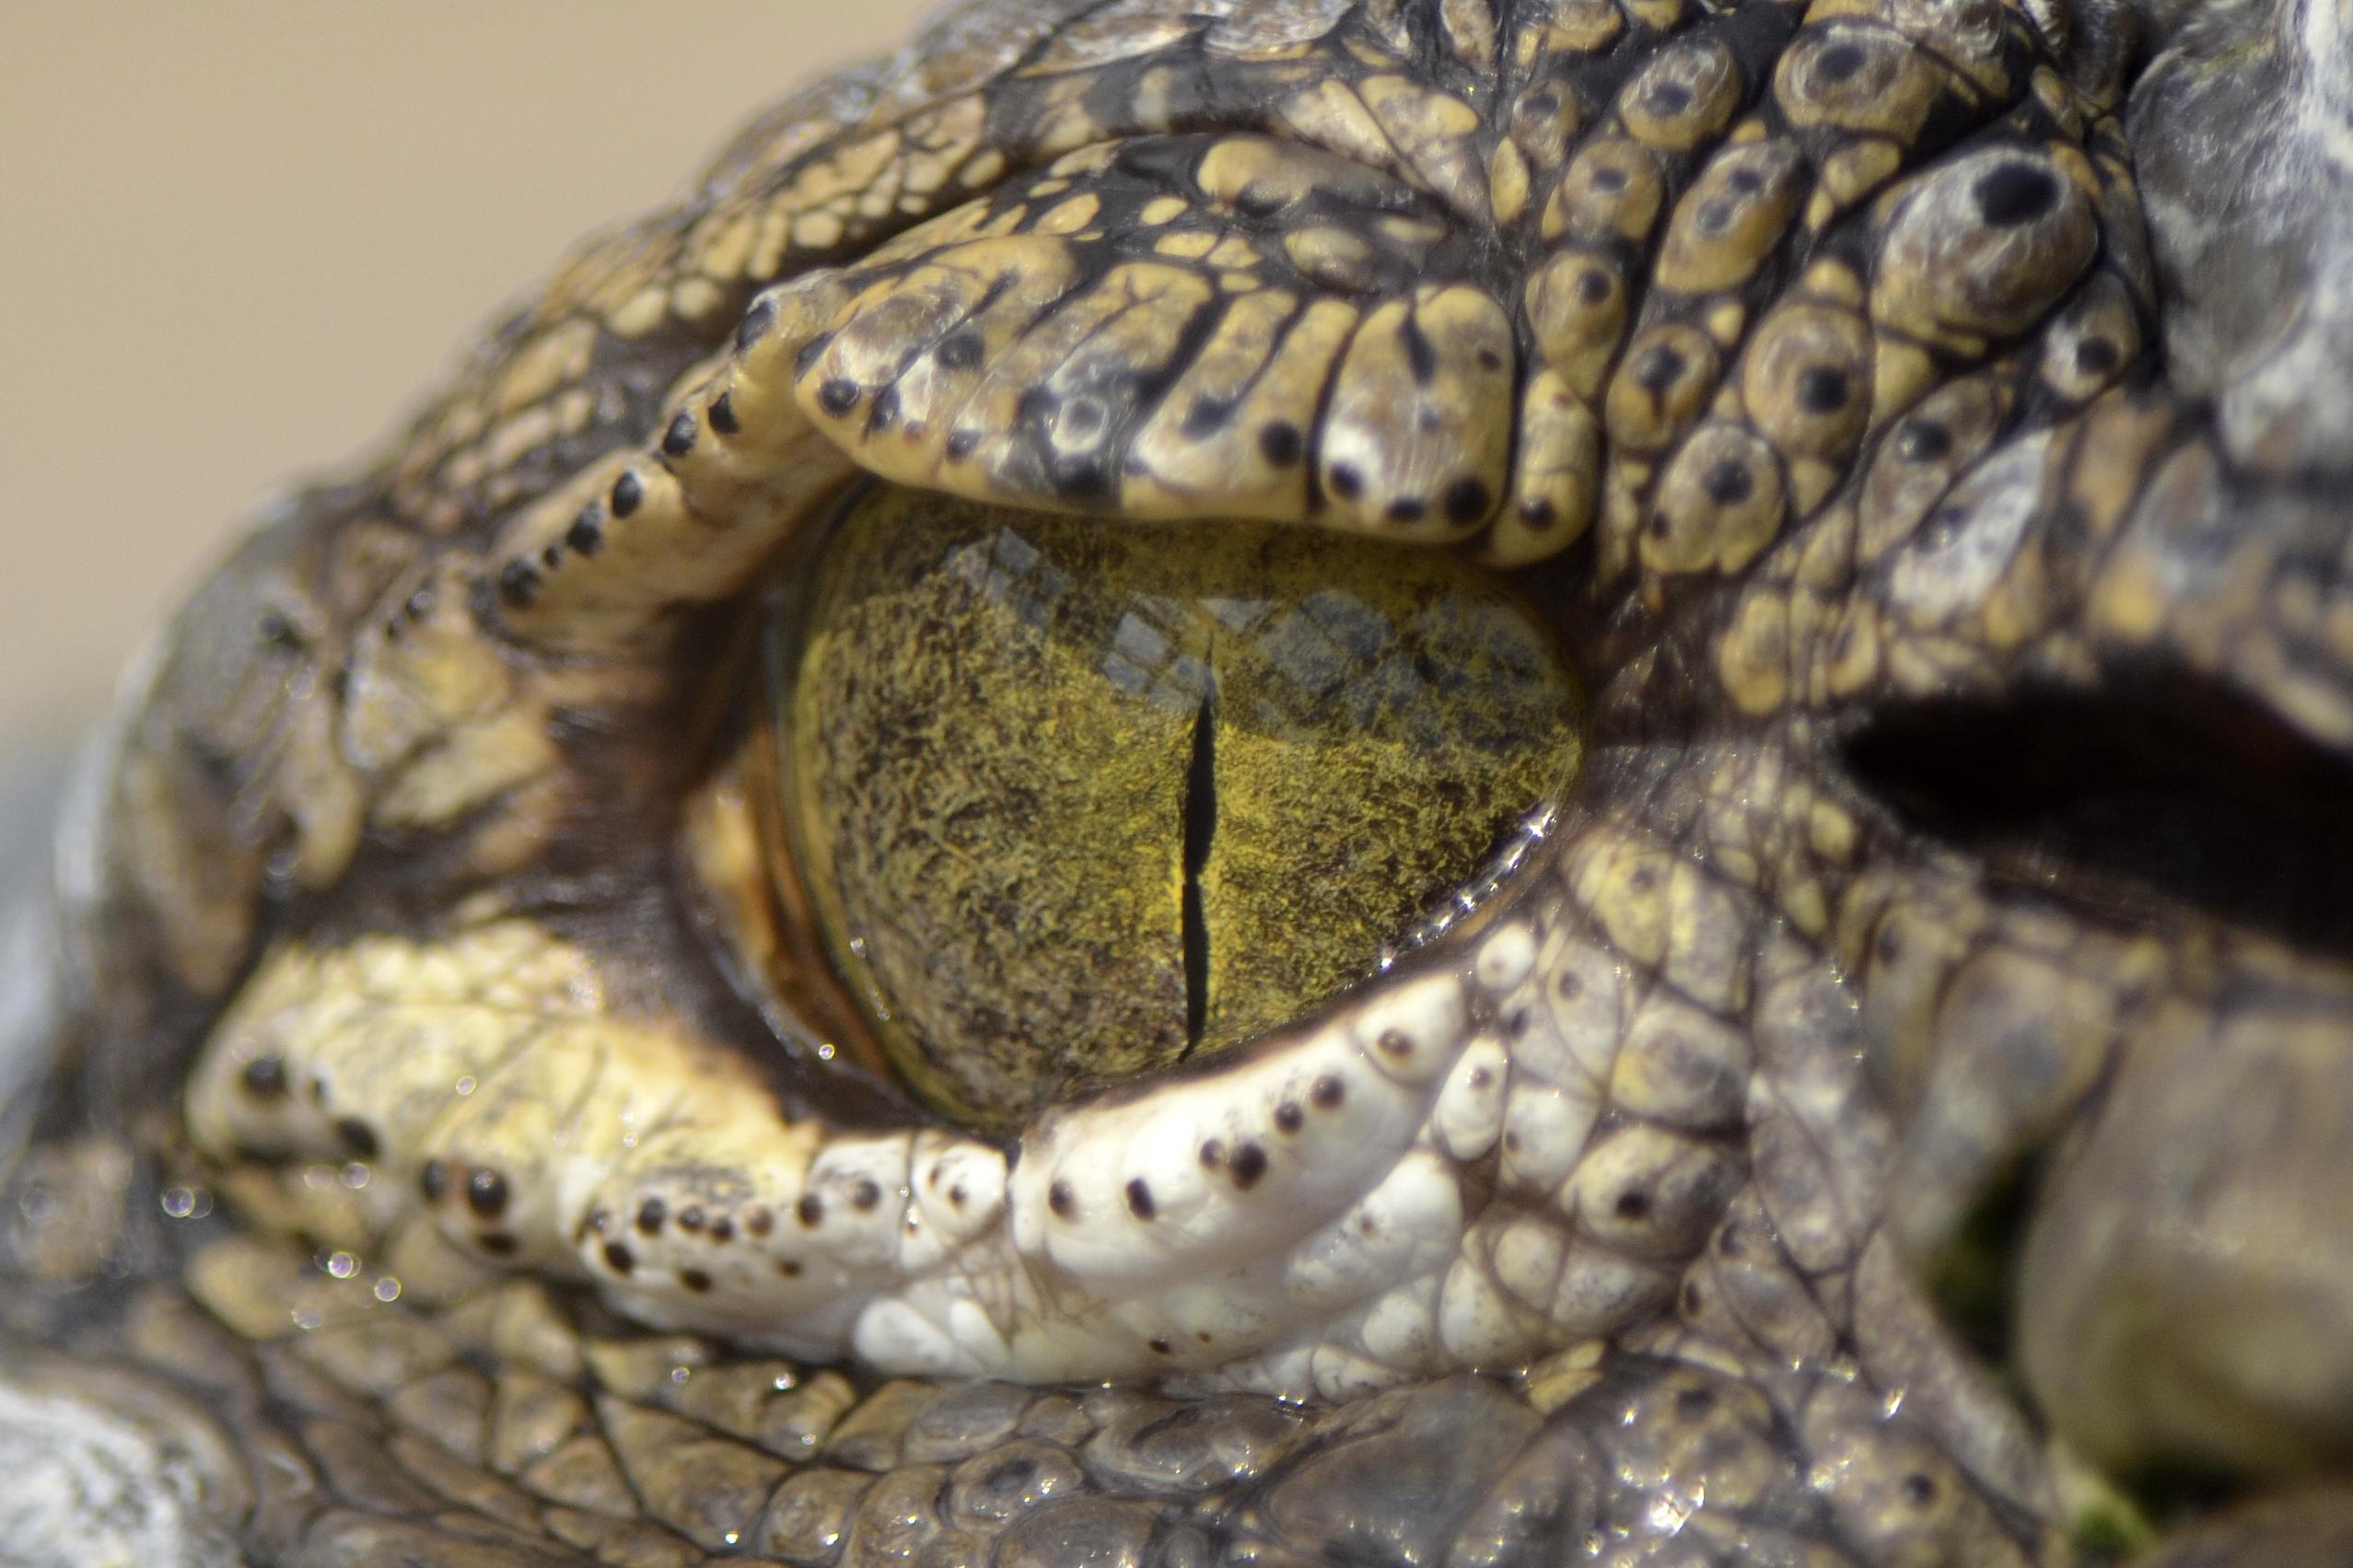 A land where strange crocodiles proliferated